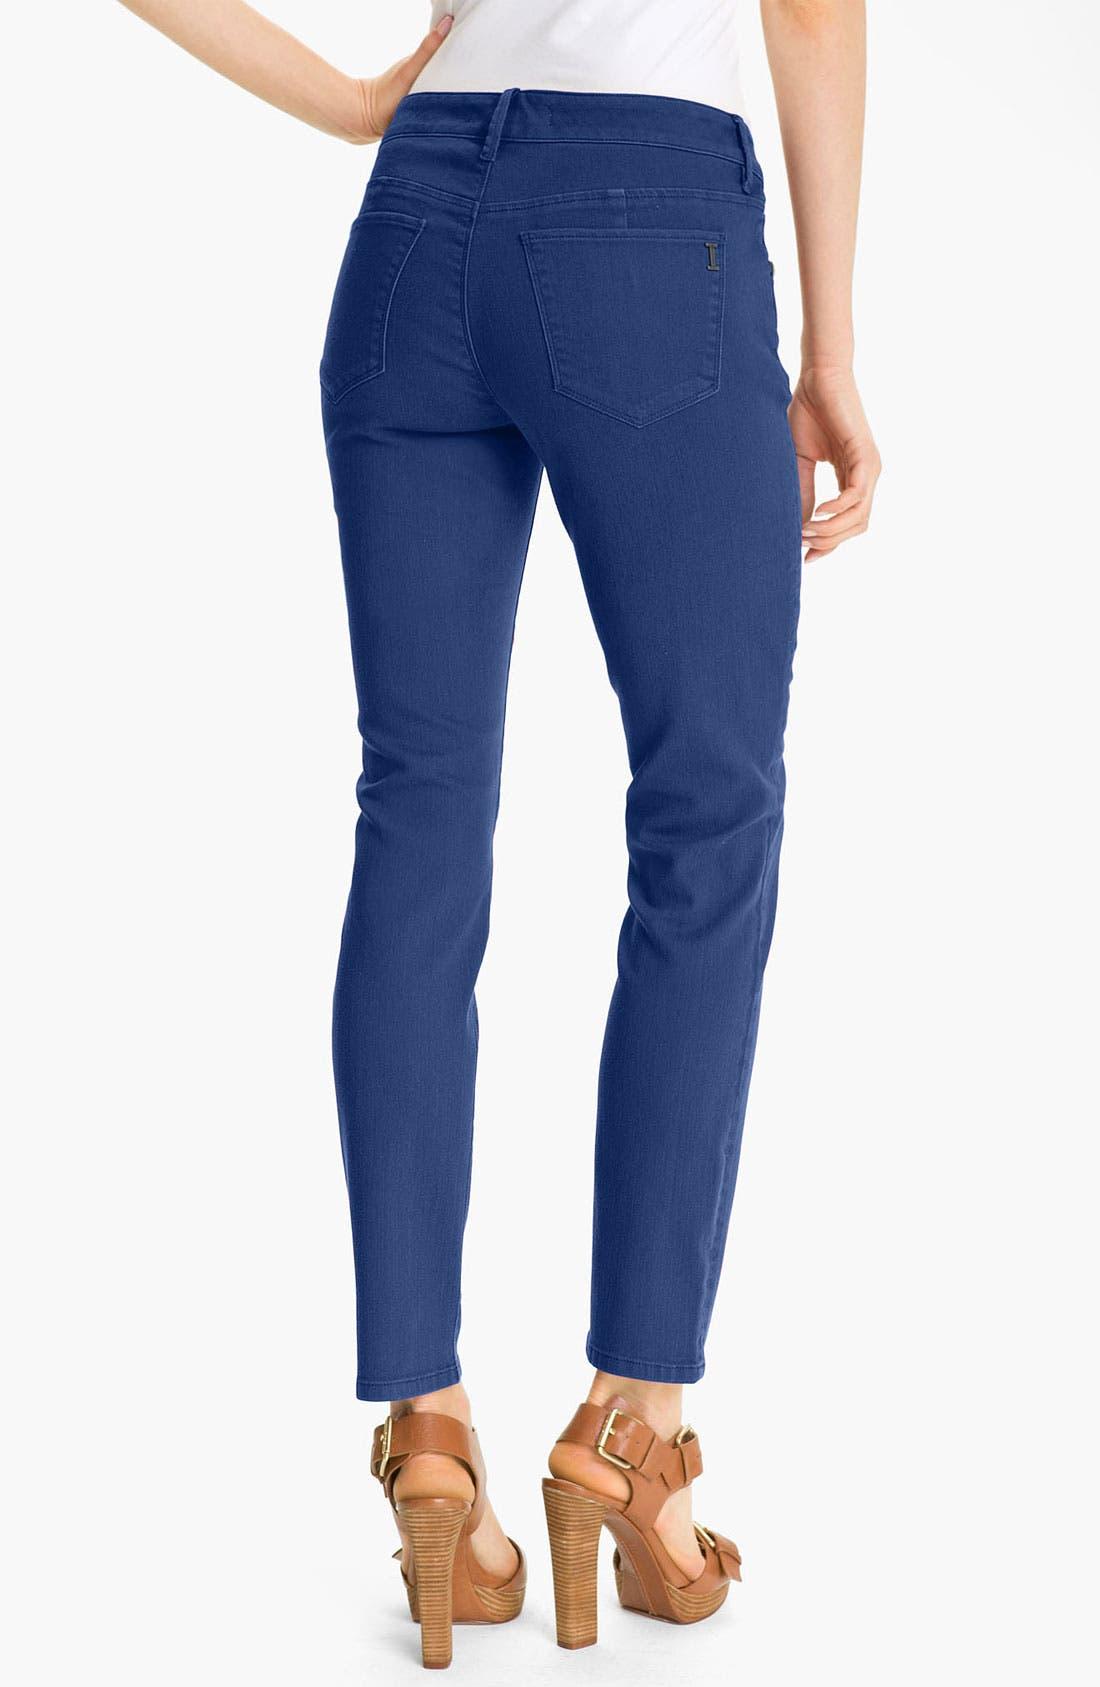 Alternate Image 2  - Isaac Mizrahi Jeans 'Samantha' Colored Denim Skinny Jeans